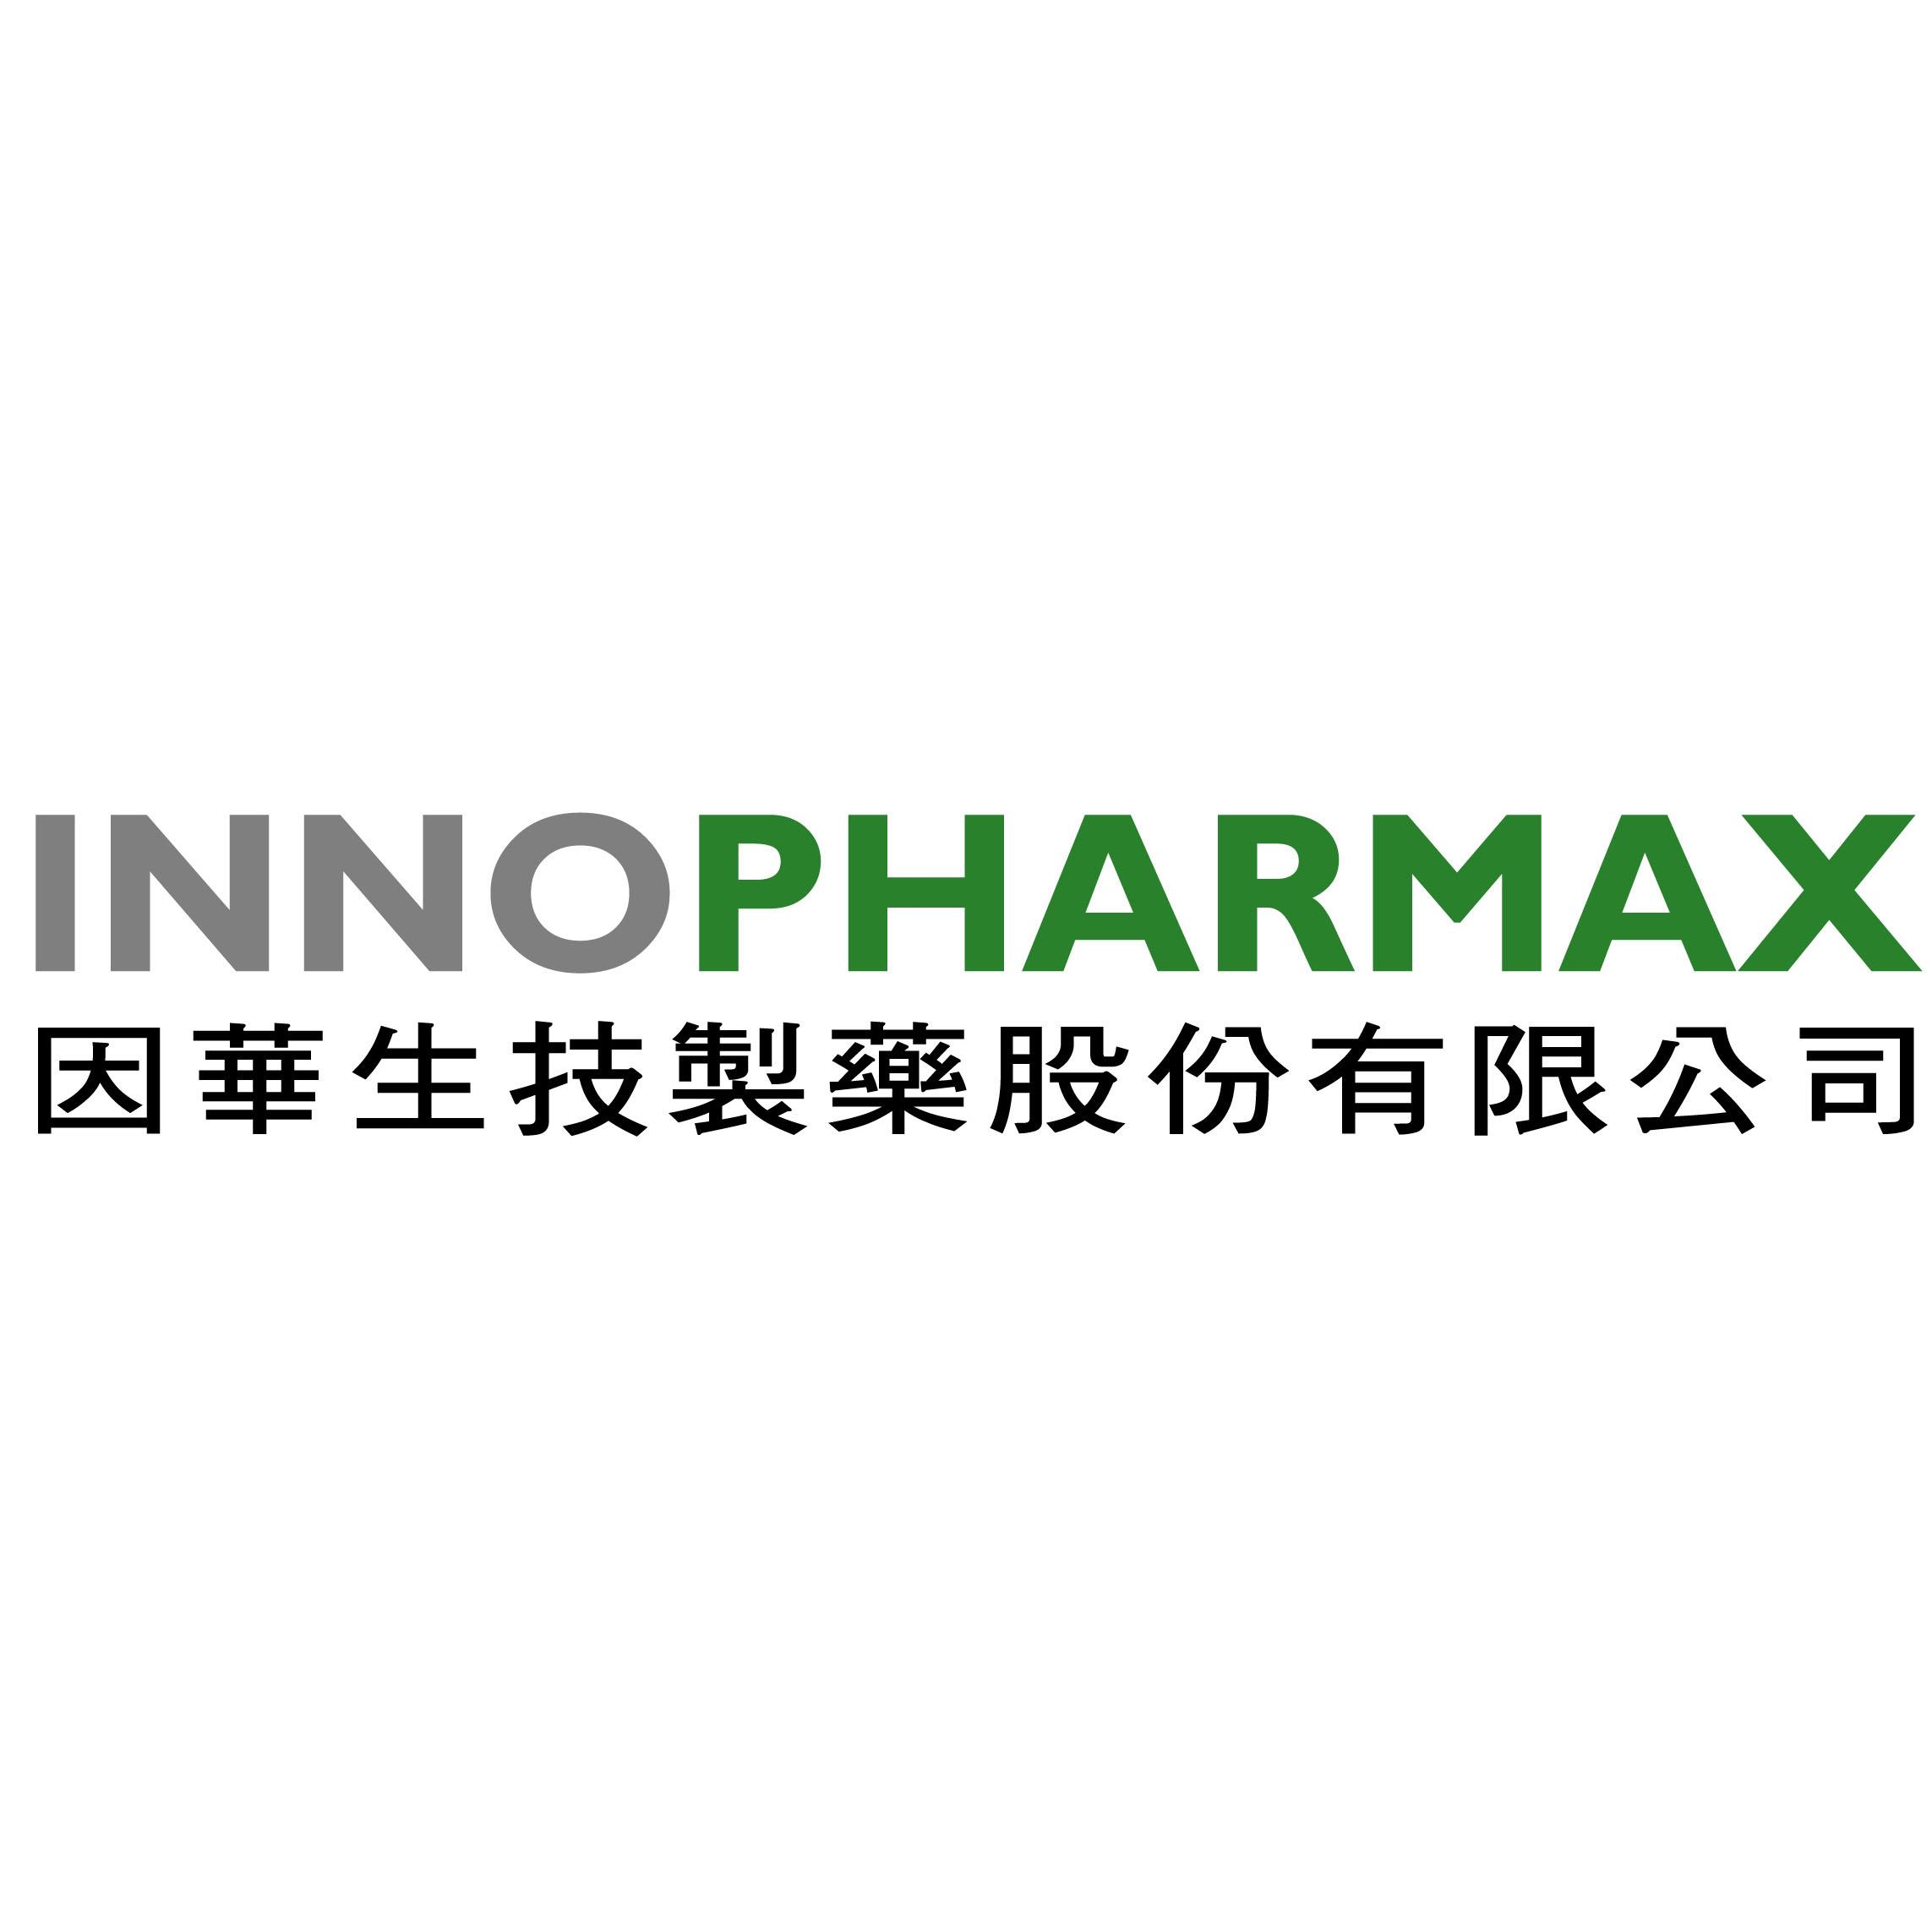 innopharmax_logo1_square